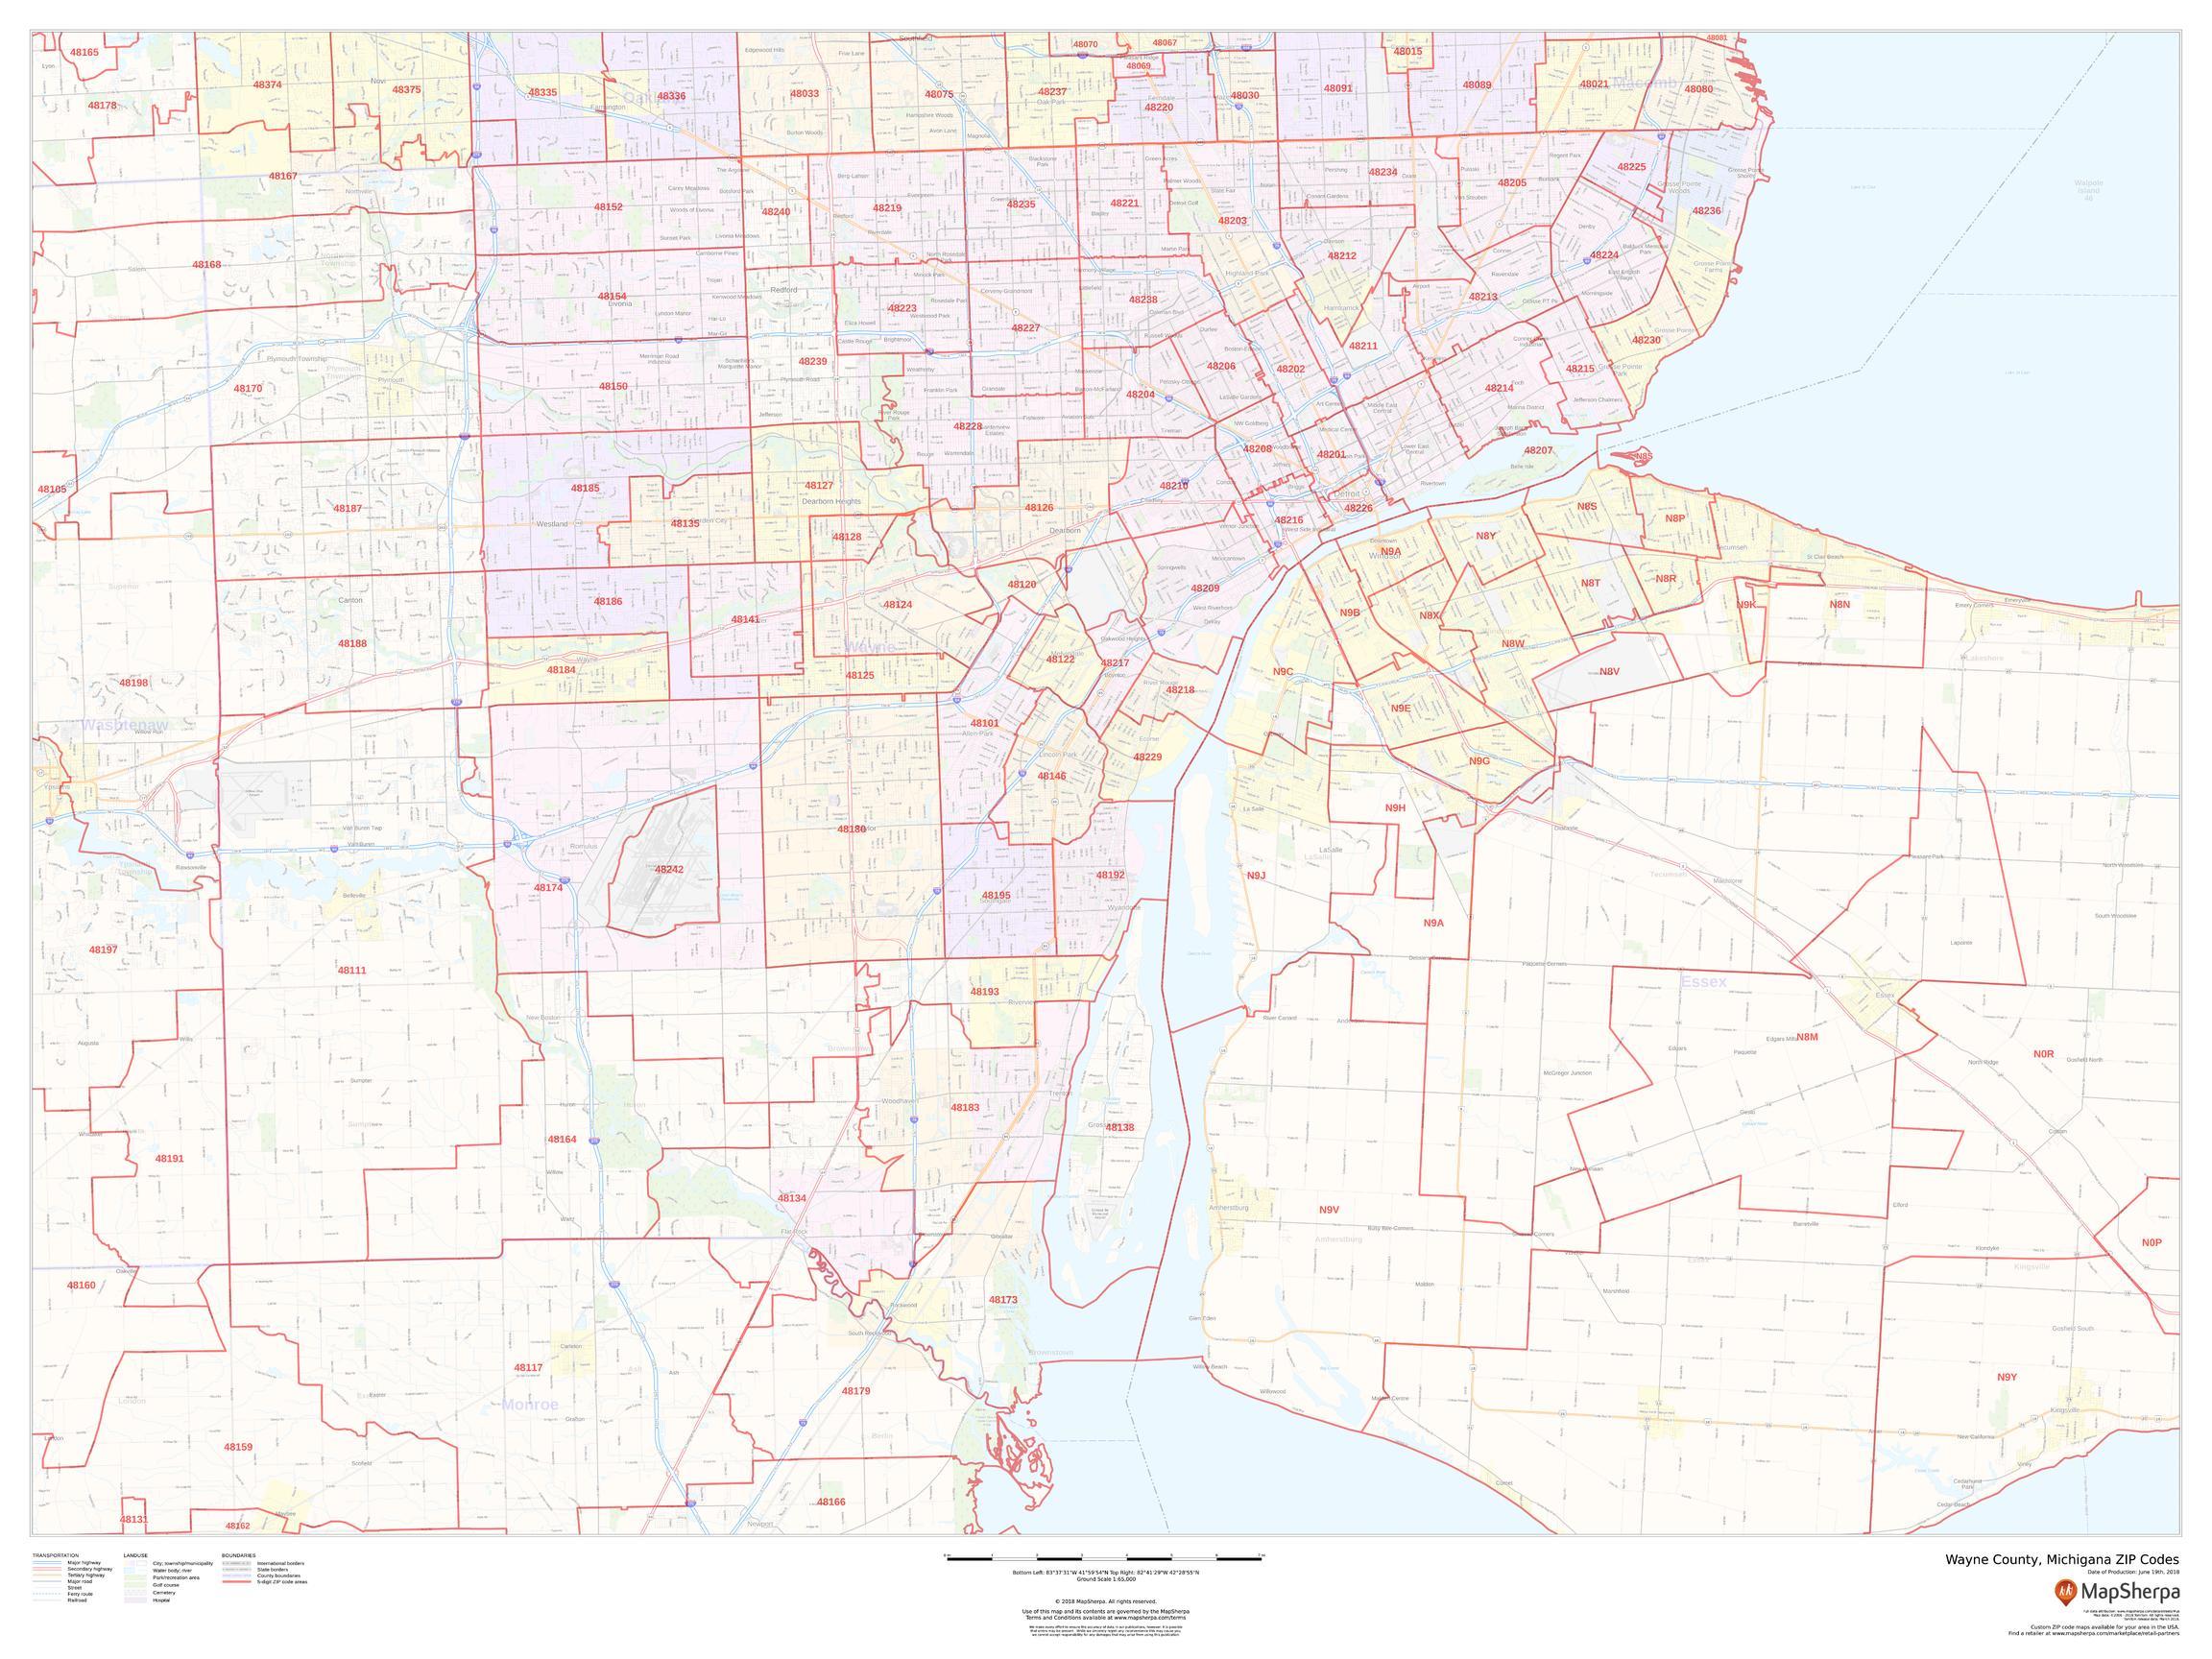 Wayne County ZIP Code Map (Michigan) on alabama counties map, kansas counties map, oklahoma counties map, mississippi counties map, northern iowa counties map, new mexico counties map, utah counties map, rhode island counties map, north dakota counties map, memphis counties map, hawaii counties map, wyoming counties map, northern il counties map, illinois counties map, montana counties map, delaware counties map, tennessee counties map, massachusetts counties map, new hampshire counties map, minnesota counties map,